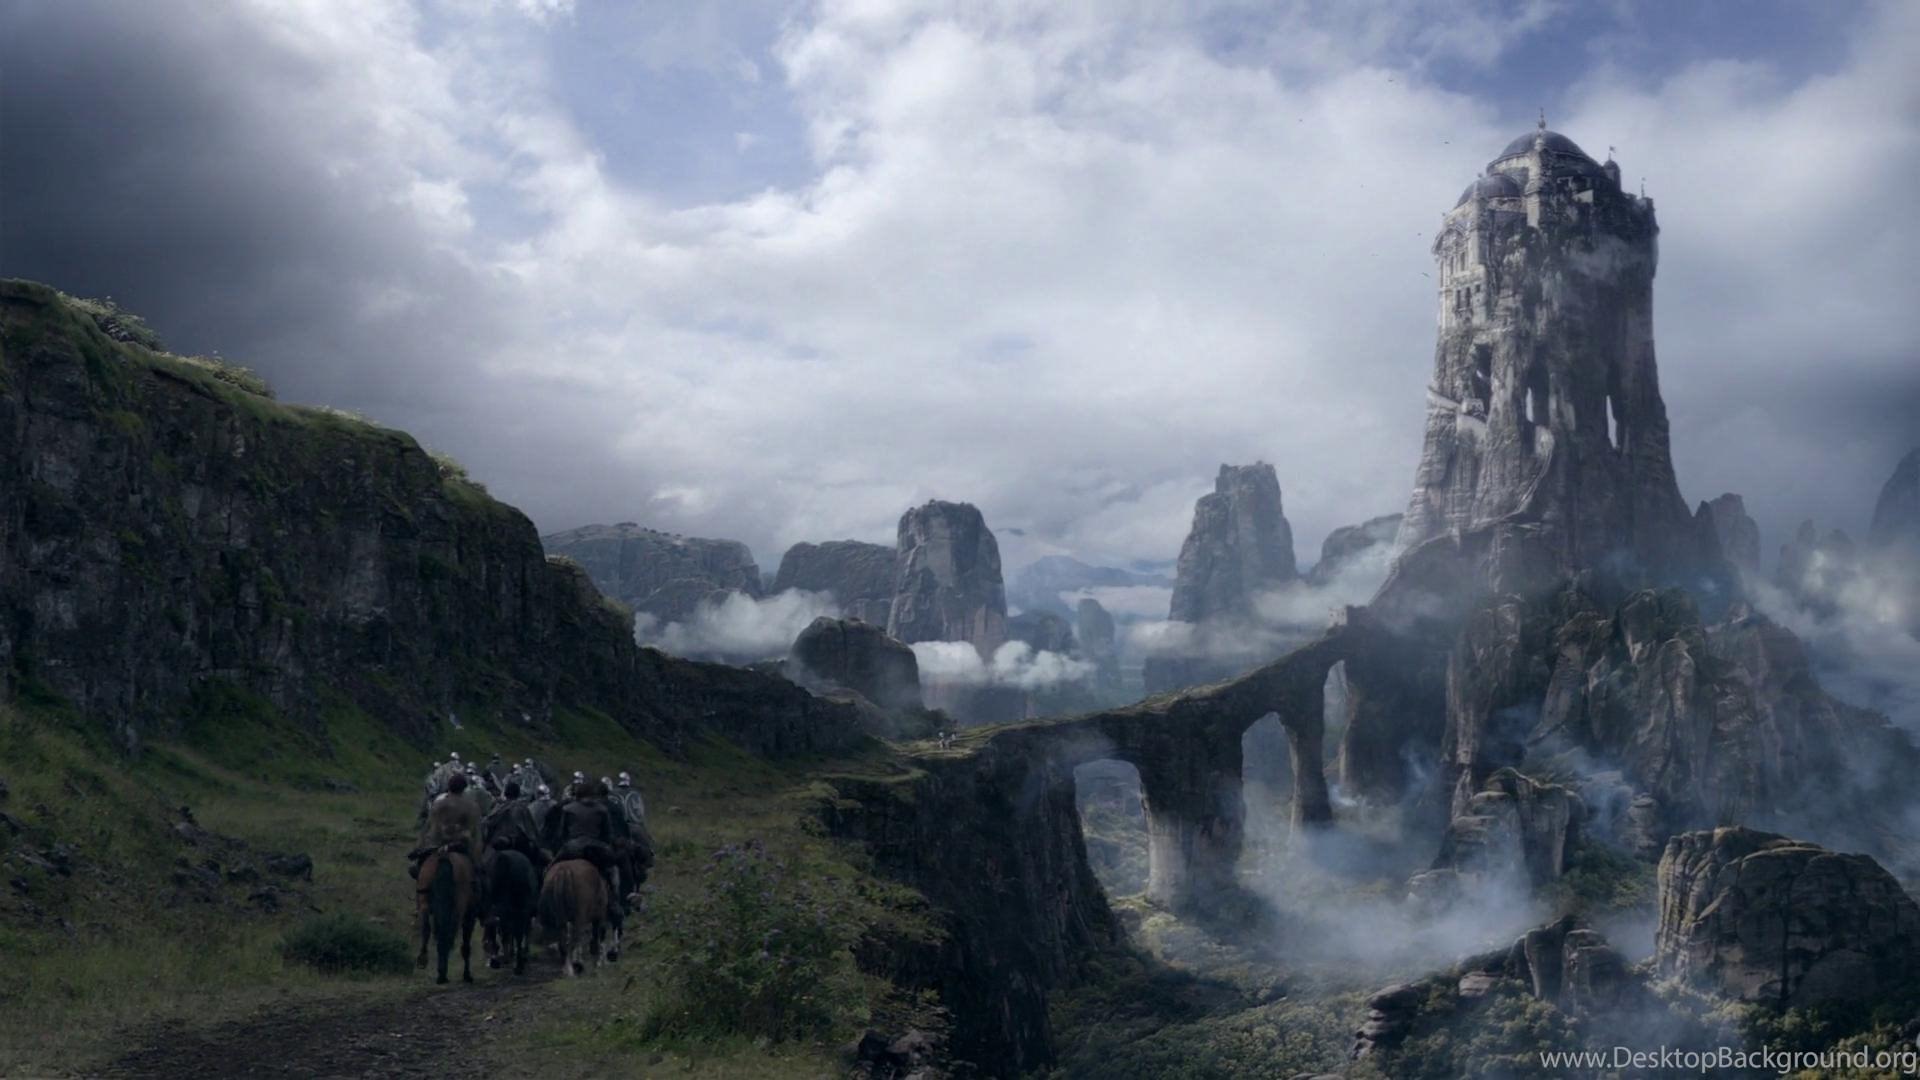 Game Of Thrones Backgrounds Free Download Desktop Background